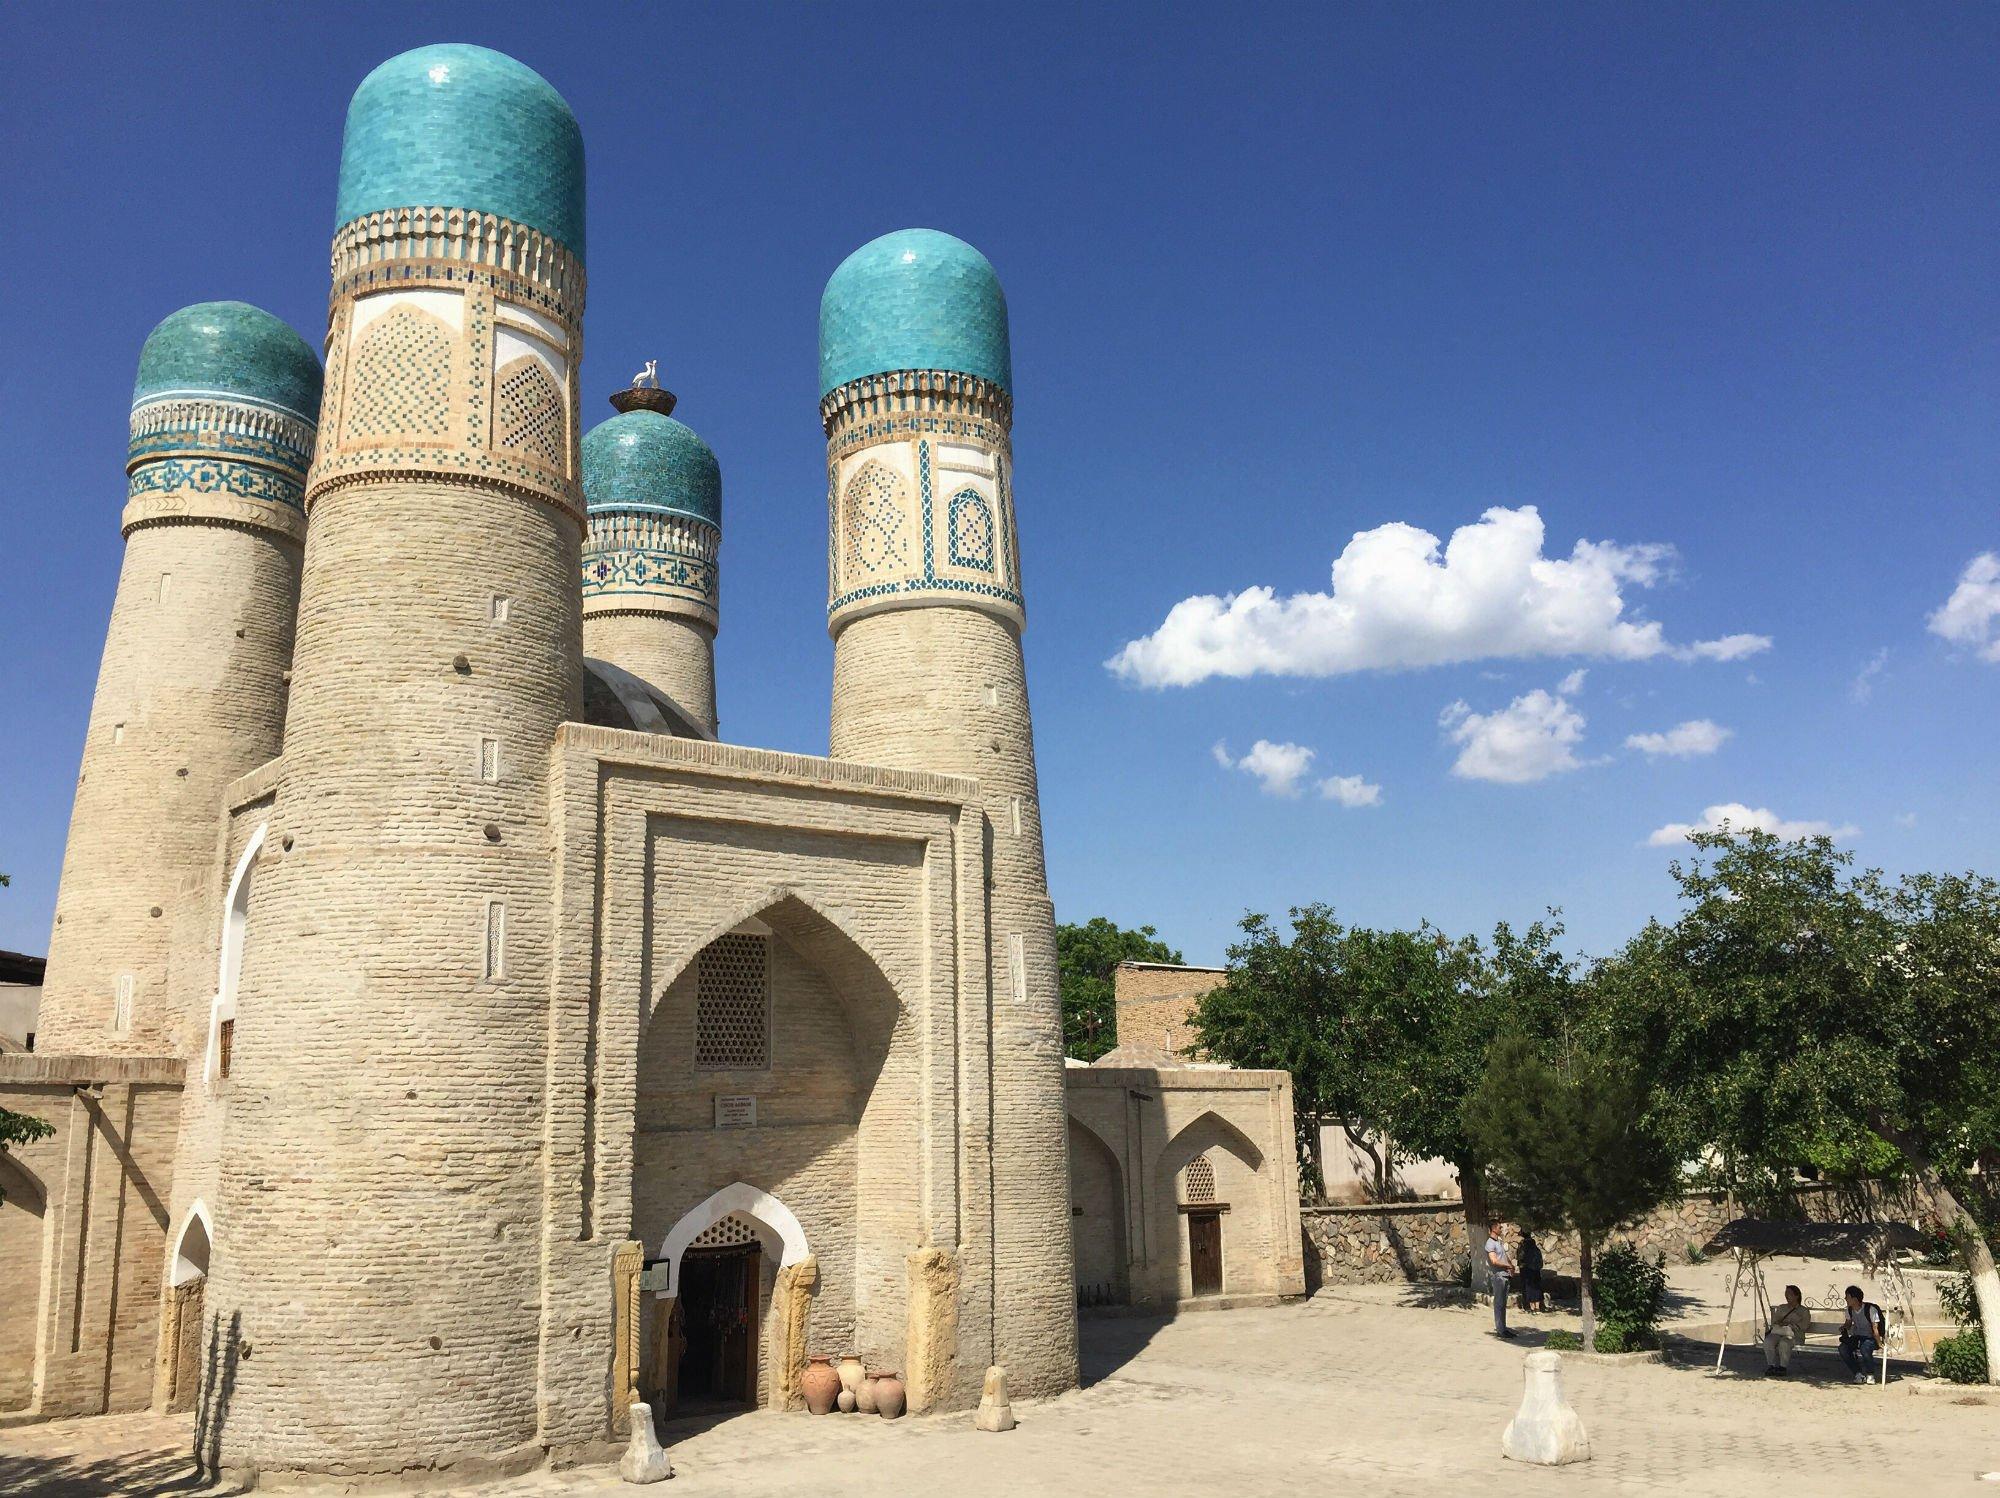 UZBEKISTAN Bukhara Chor Minor1 VIAGGIO IN UZBEKISTAN